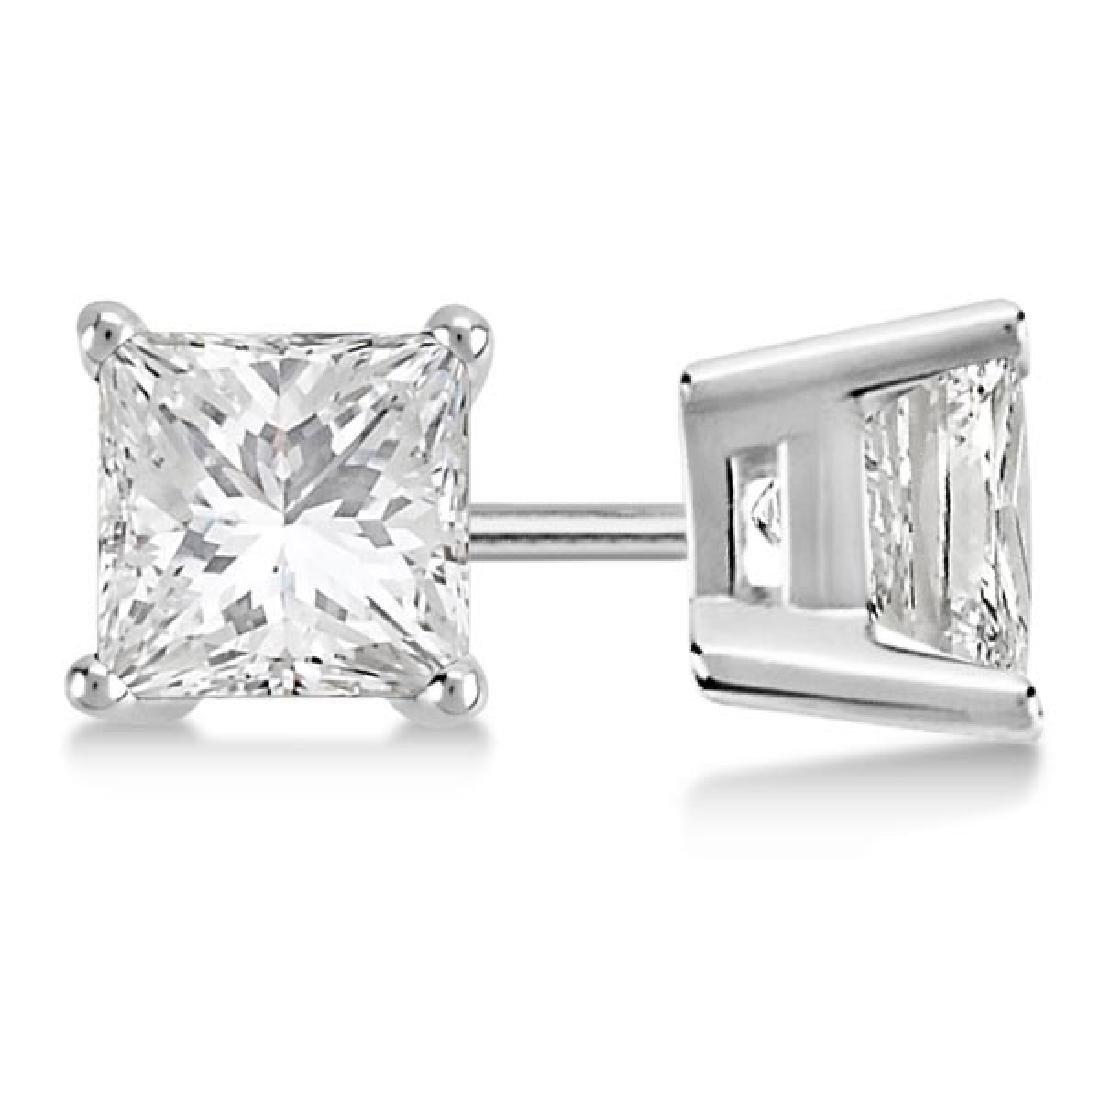 Certified 1.05 CTW Princess Diamond Stud Earrings D/SI2